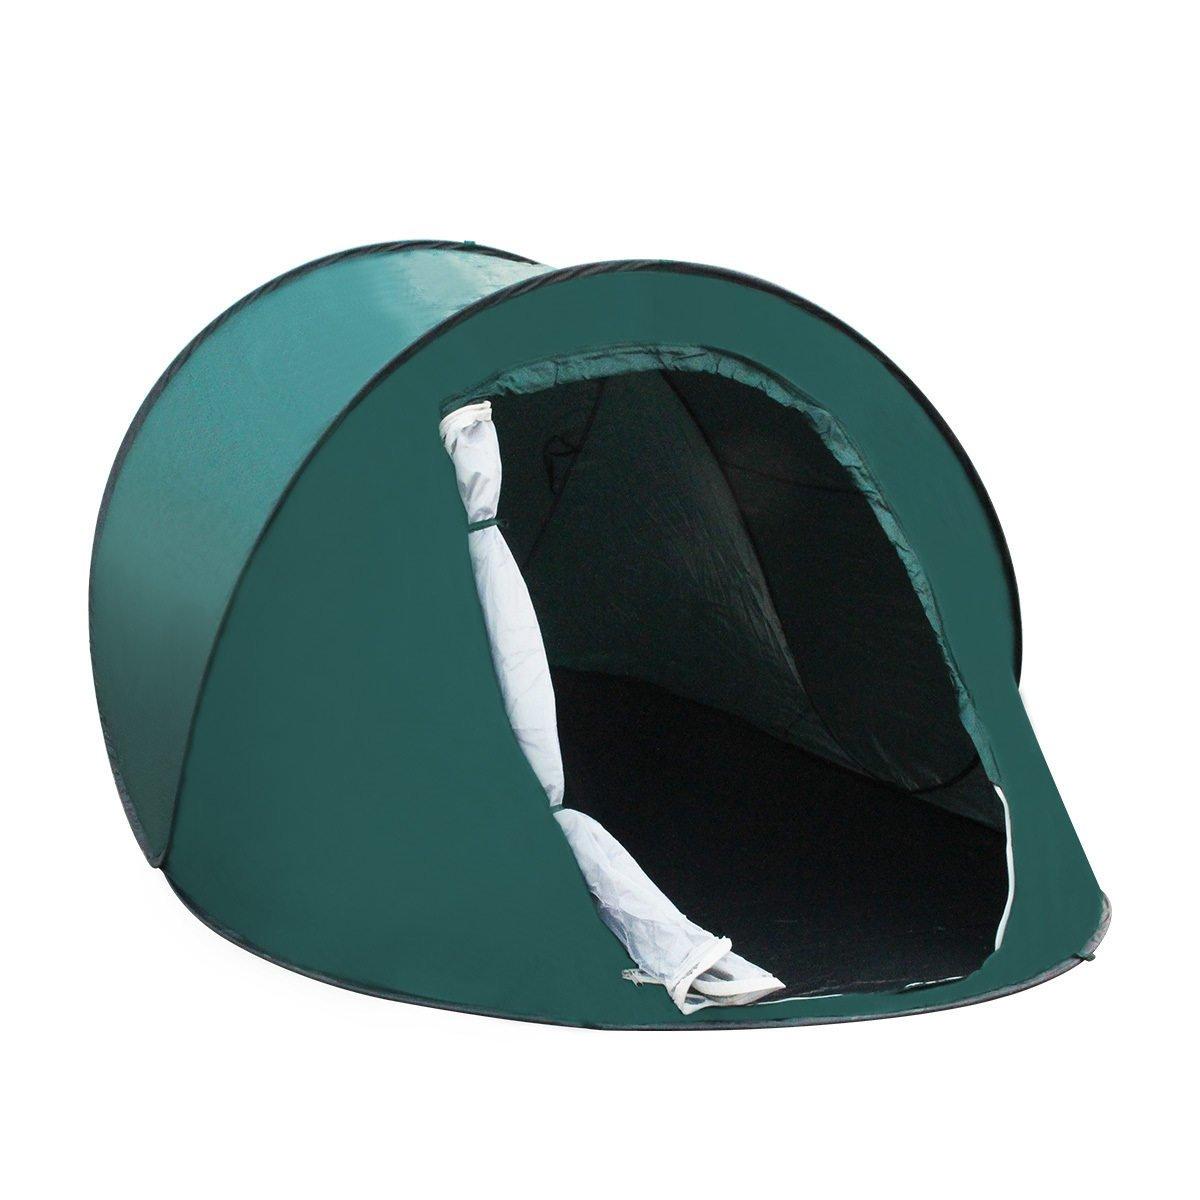 BFMEI Outdoor Strand Camping Zelt,ArmyGrün-2101.3.13